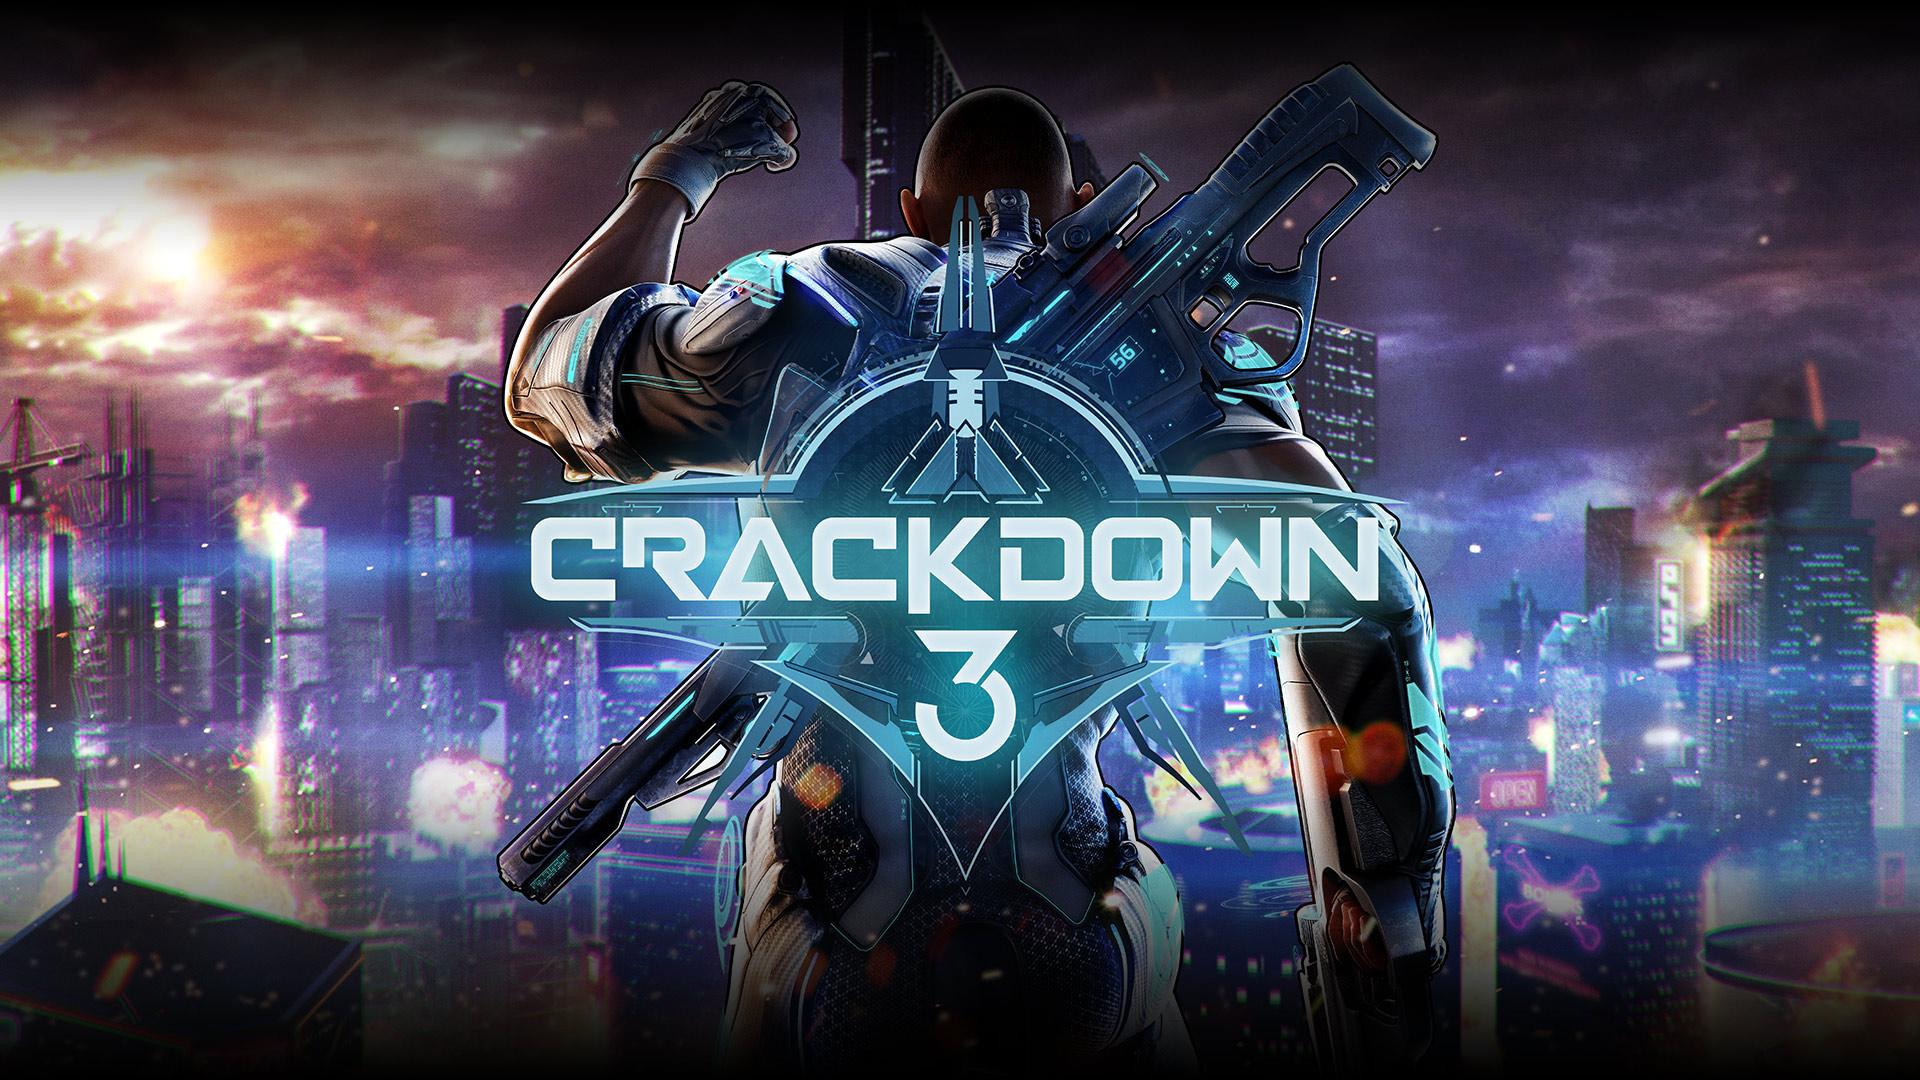 crackdown 3, story summary